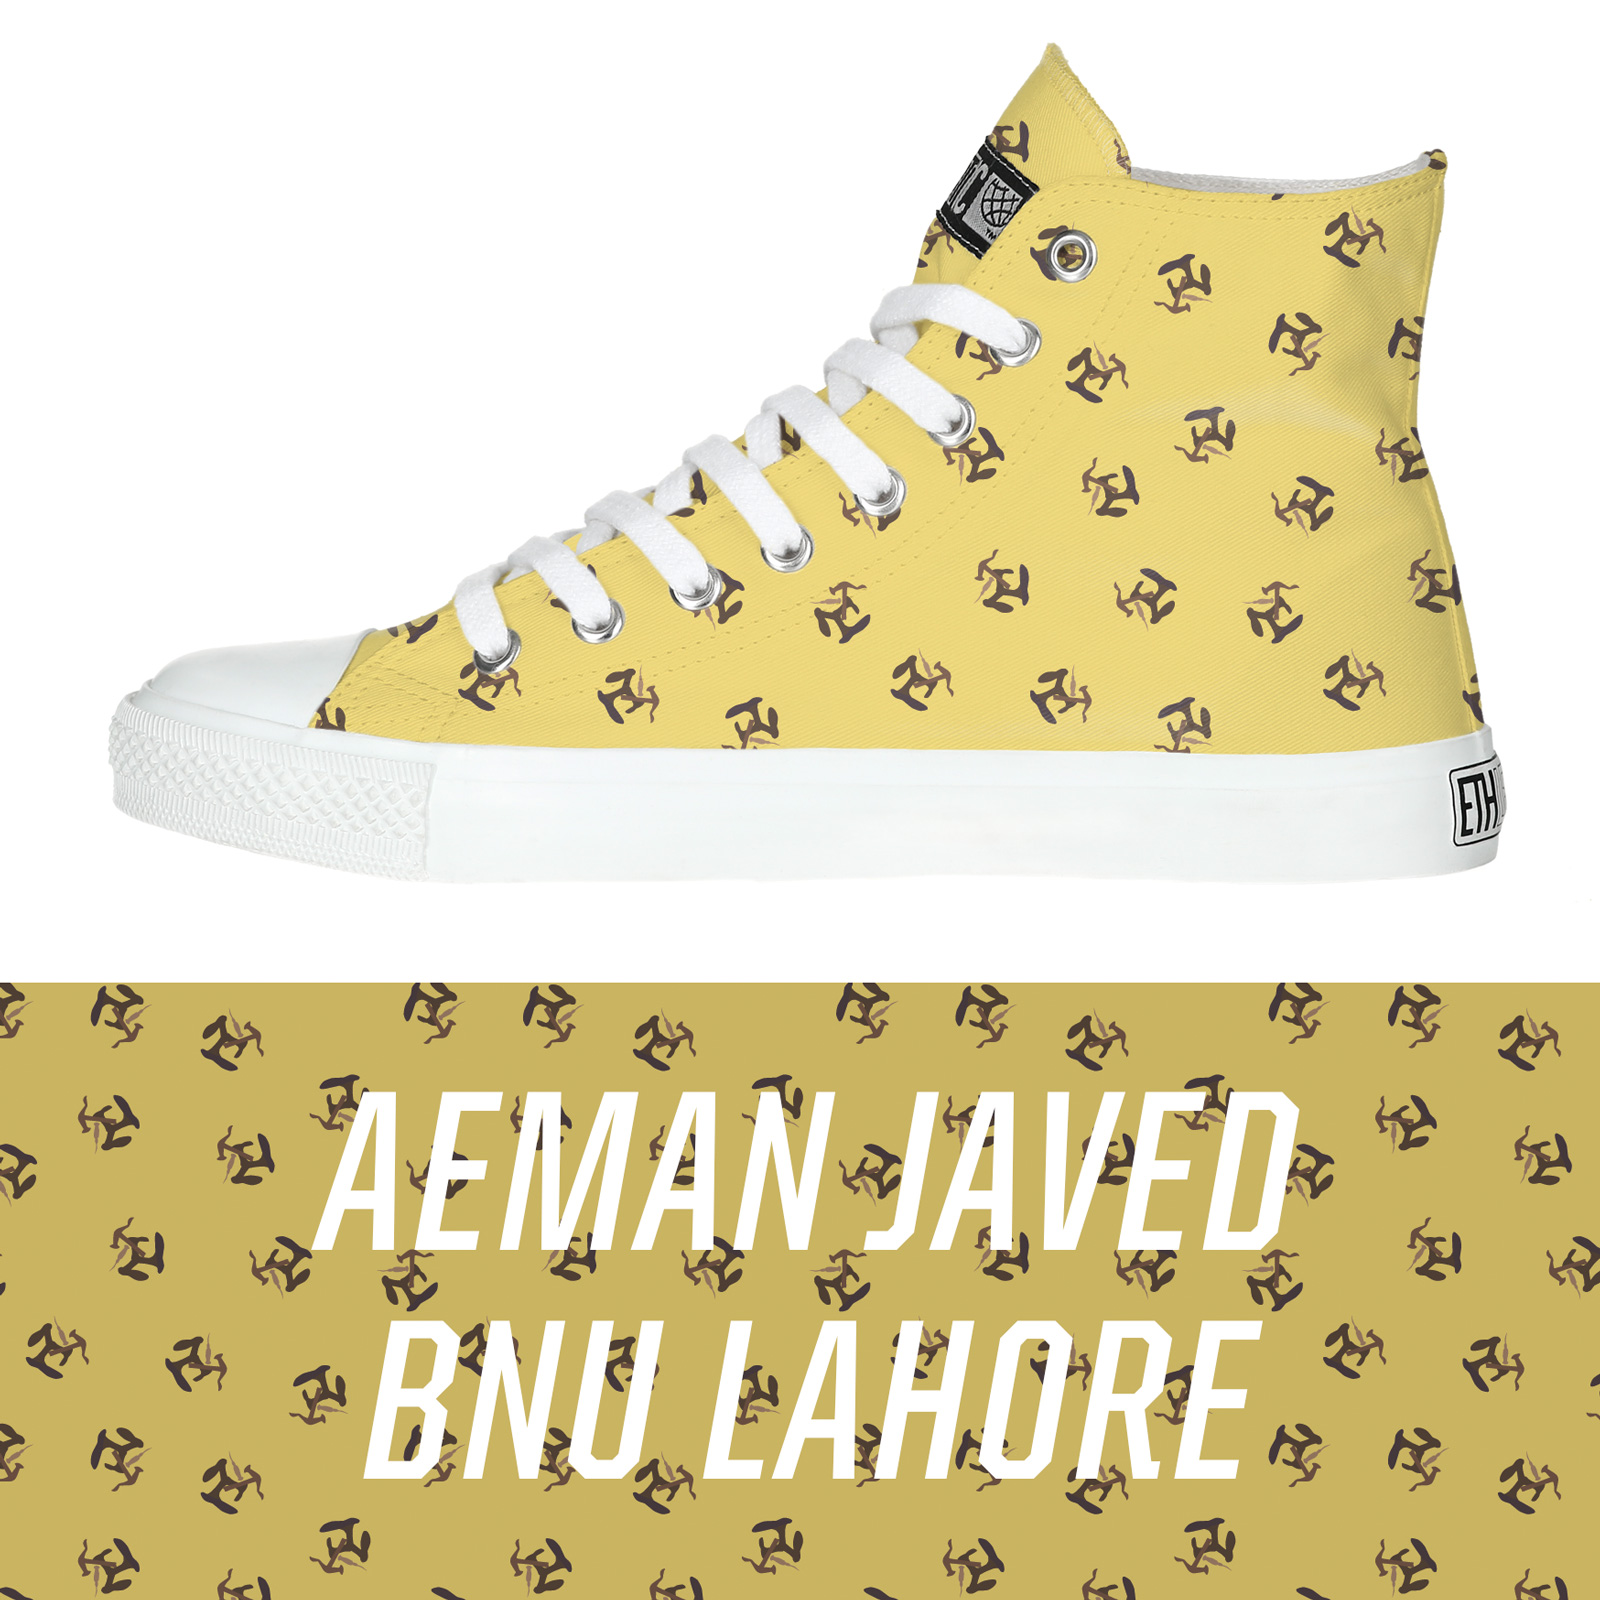 Aeman_Javed